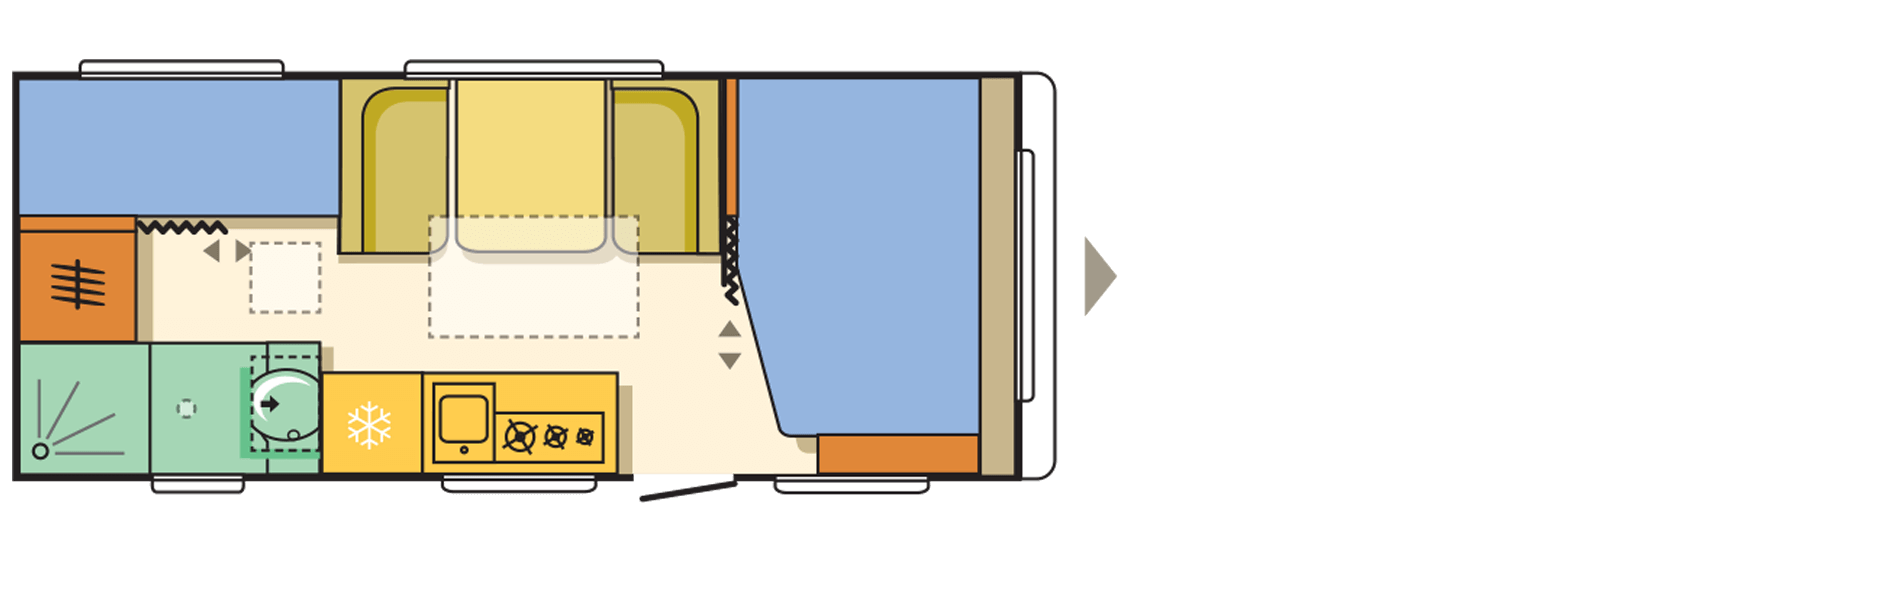 דגם אלטאה